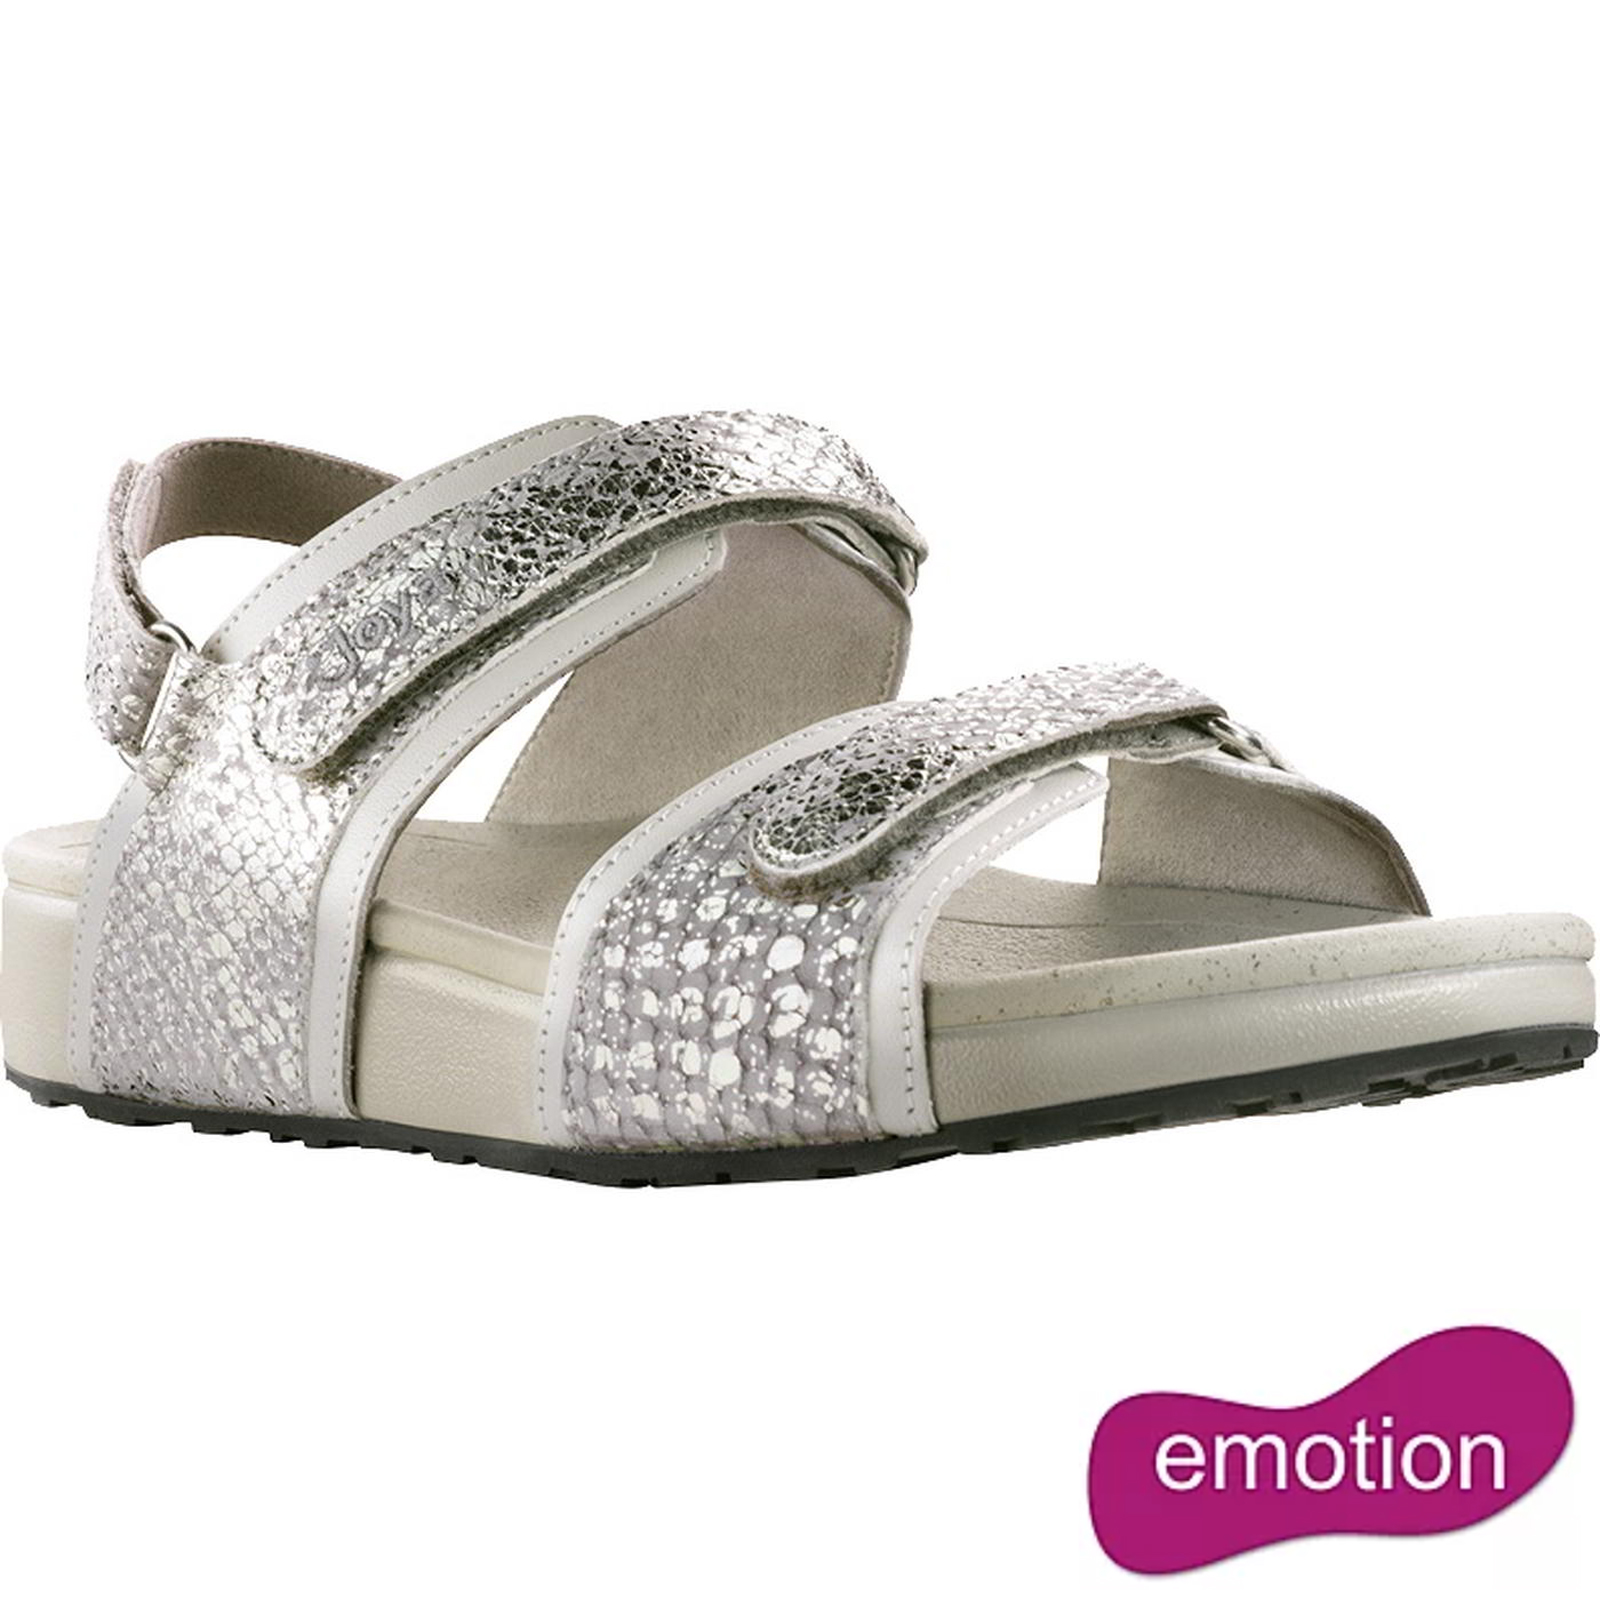 Joya Womens Amalfi Sandals - Silver